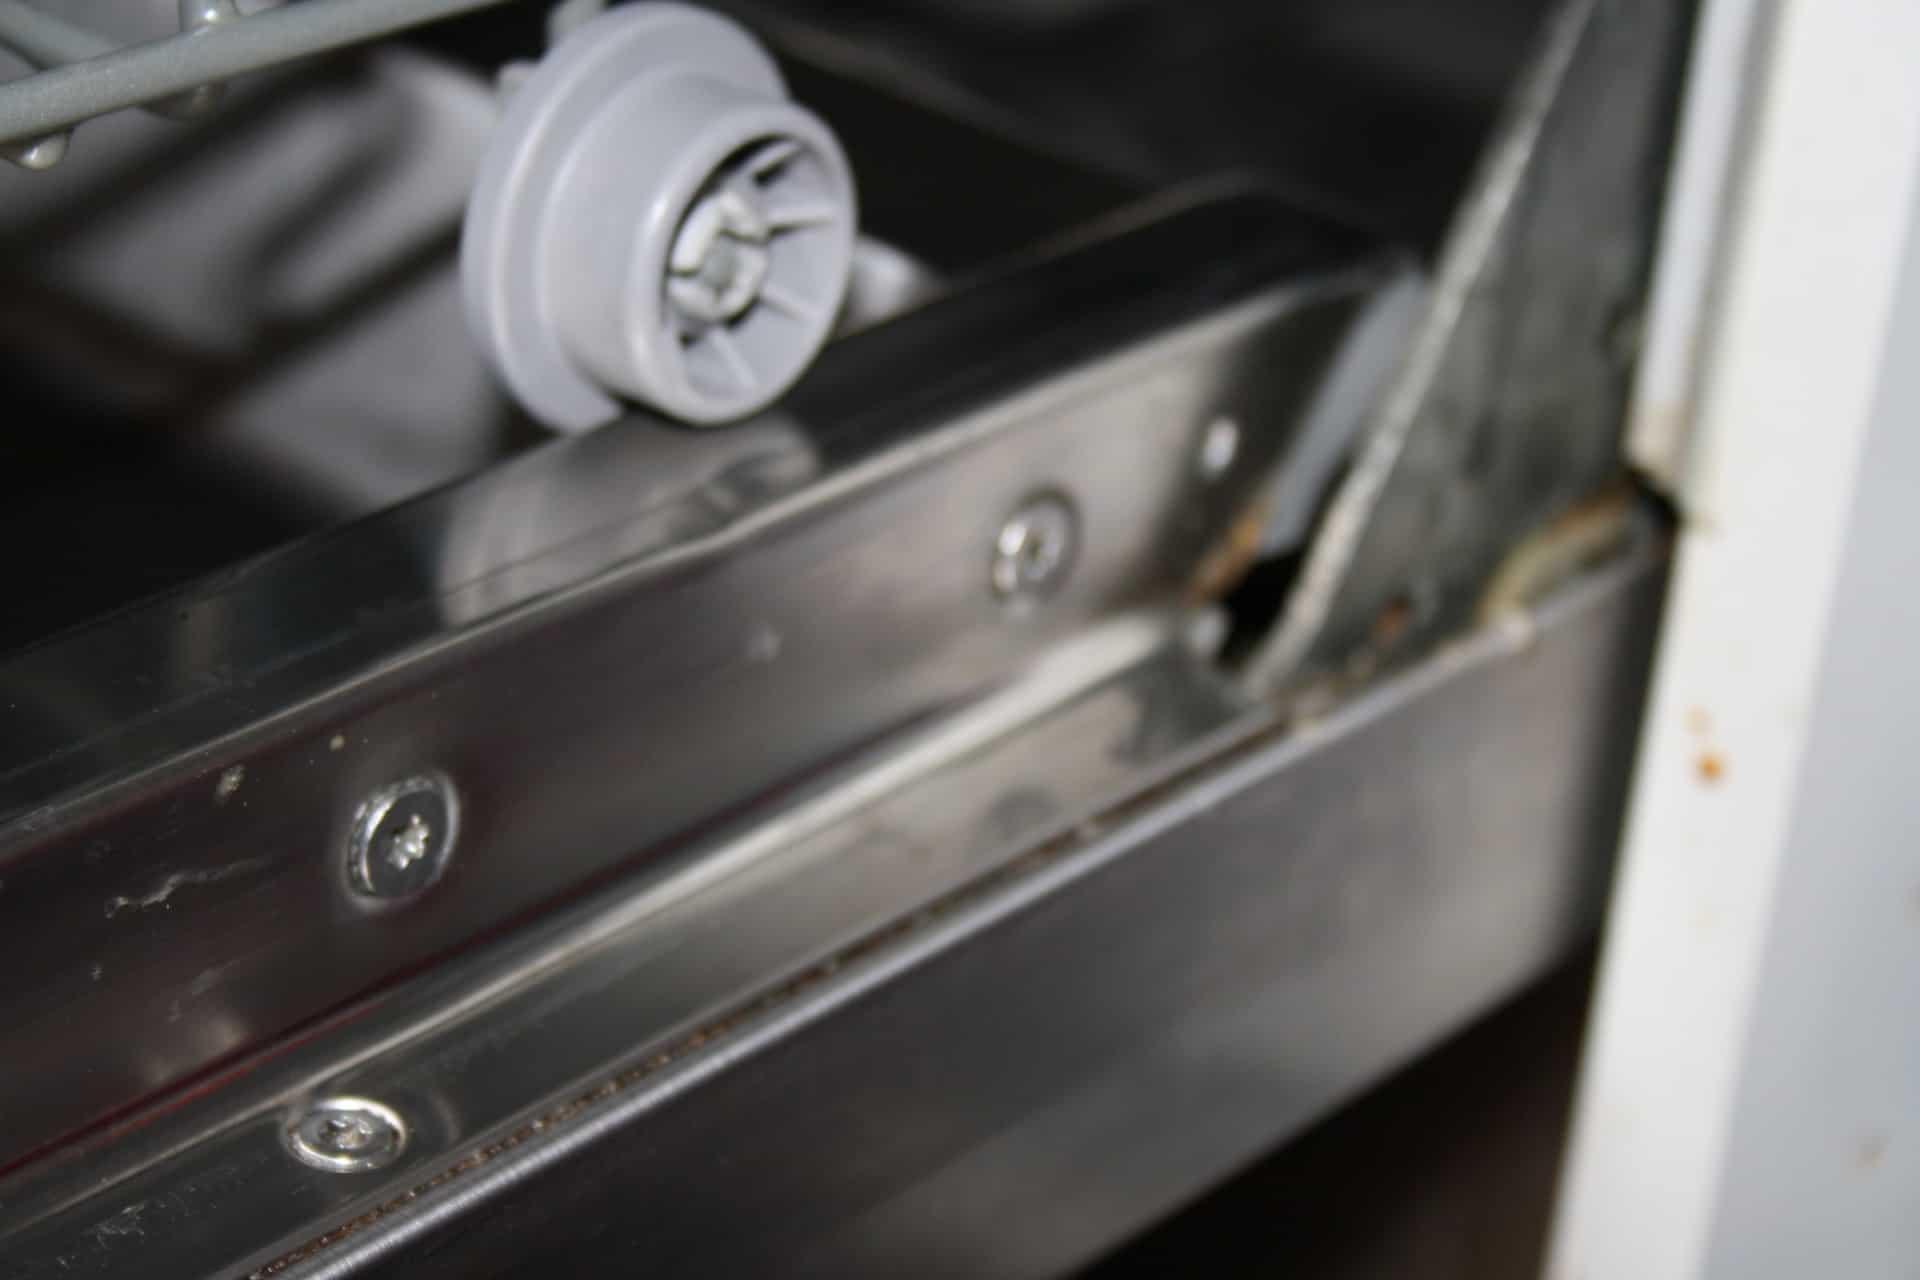 siemens opvaskemaskine vasker ikke rent